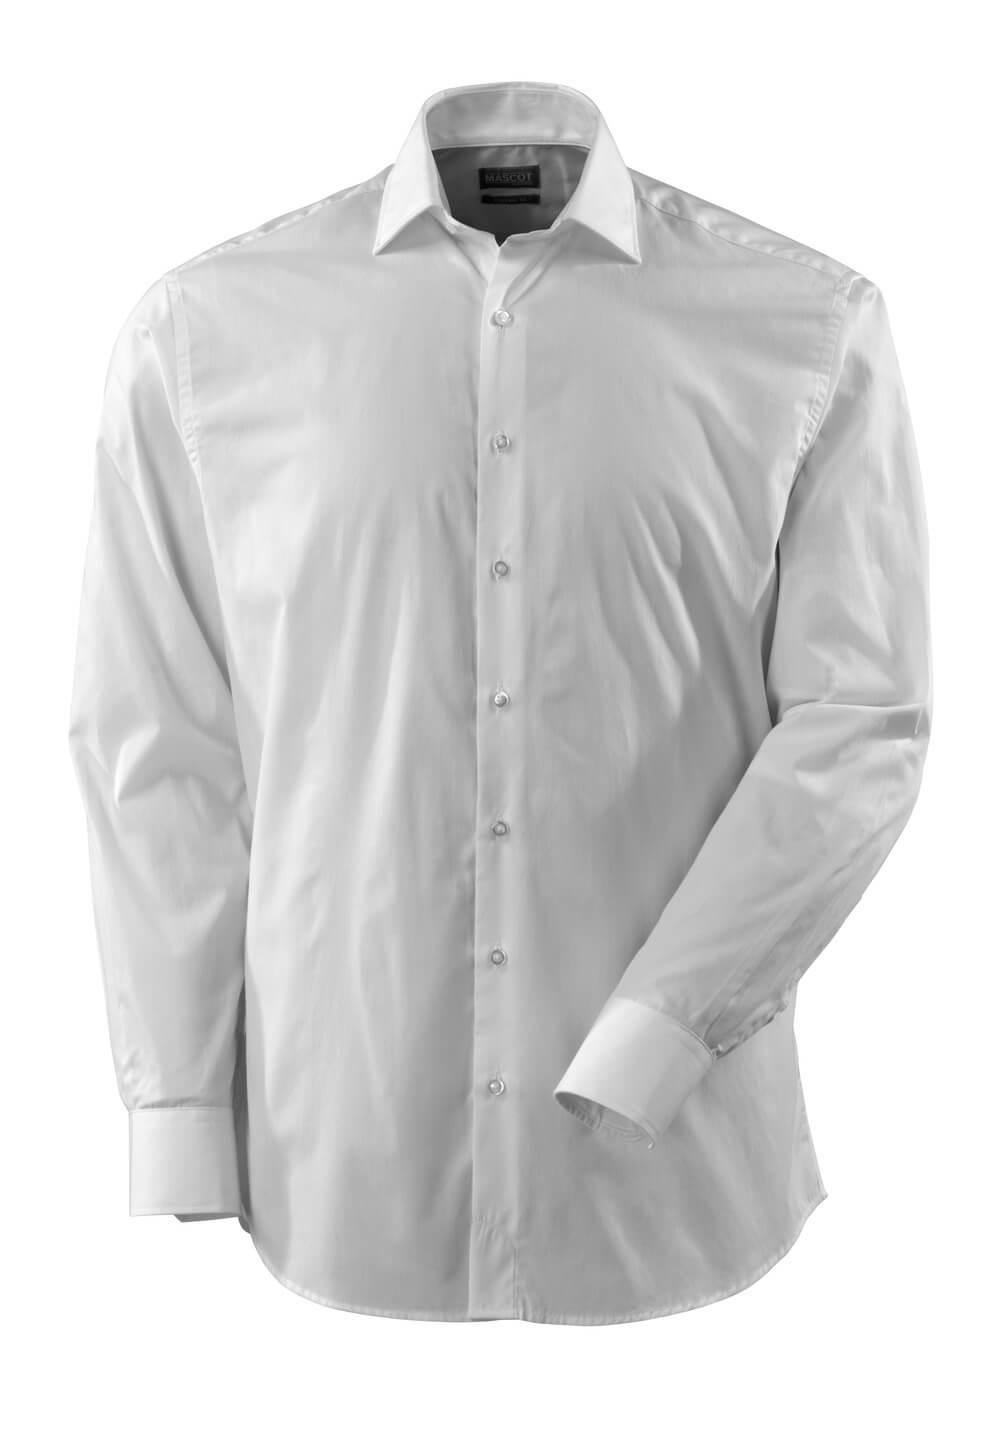 50631-984-06 Overhemd - wit